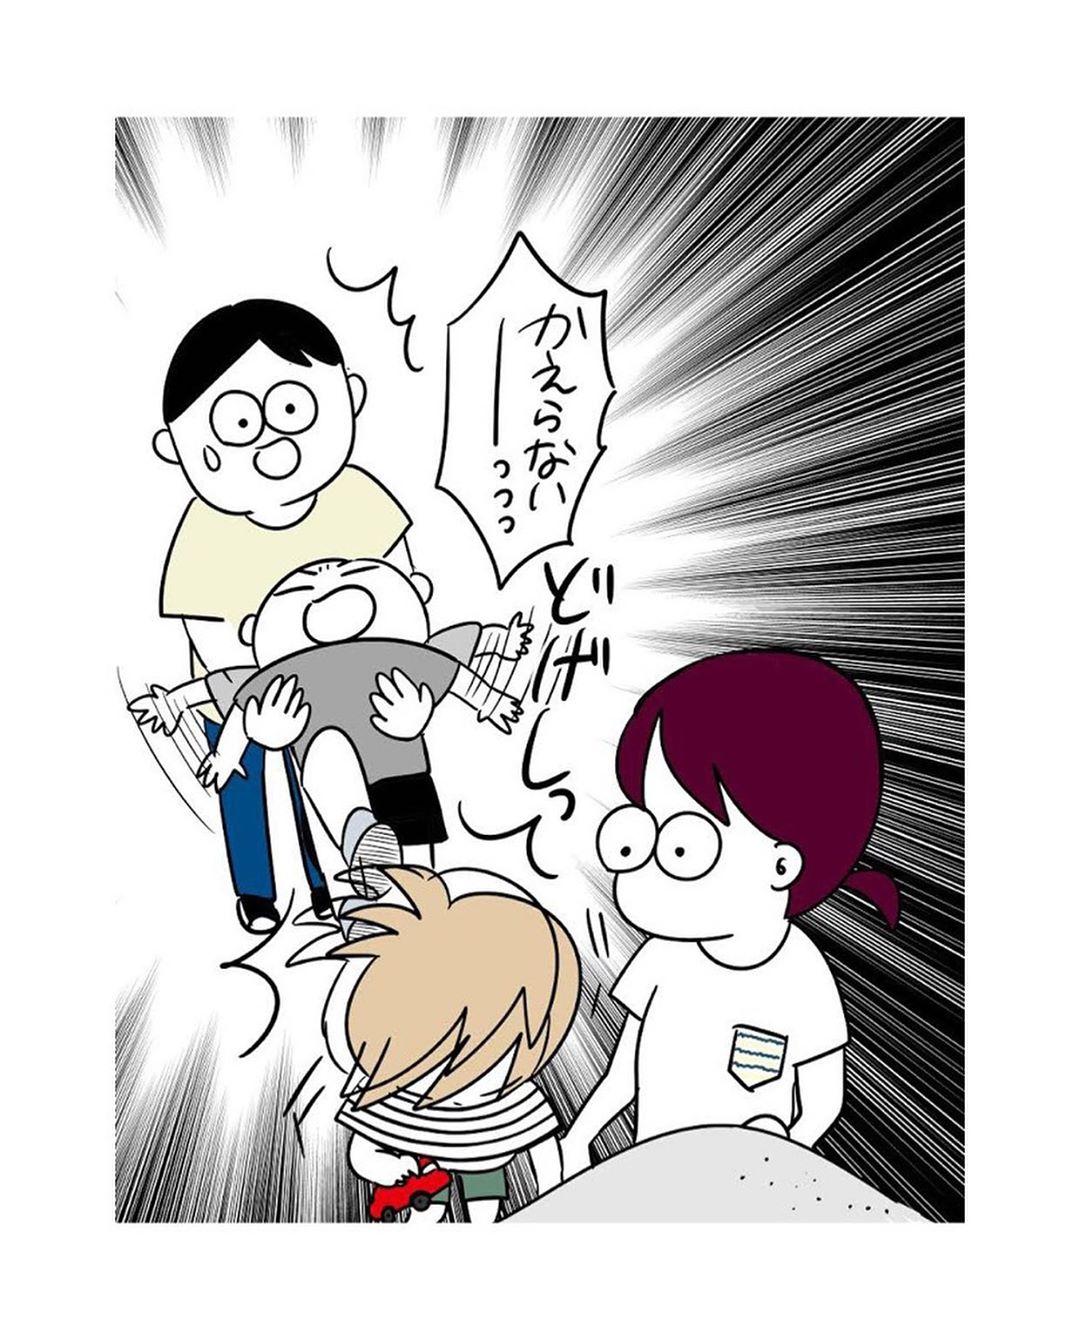 shirota.yunya_72396910_436239720370390_4951440985426687527_n